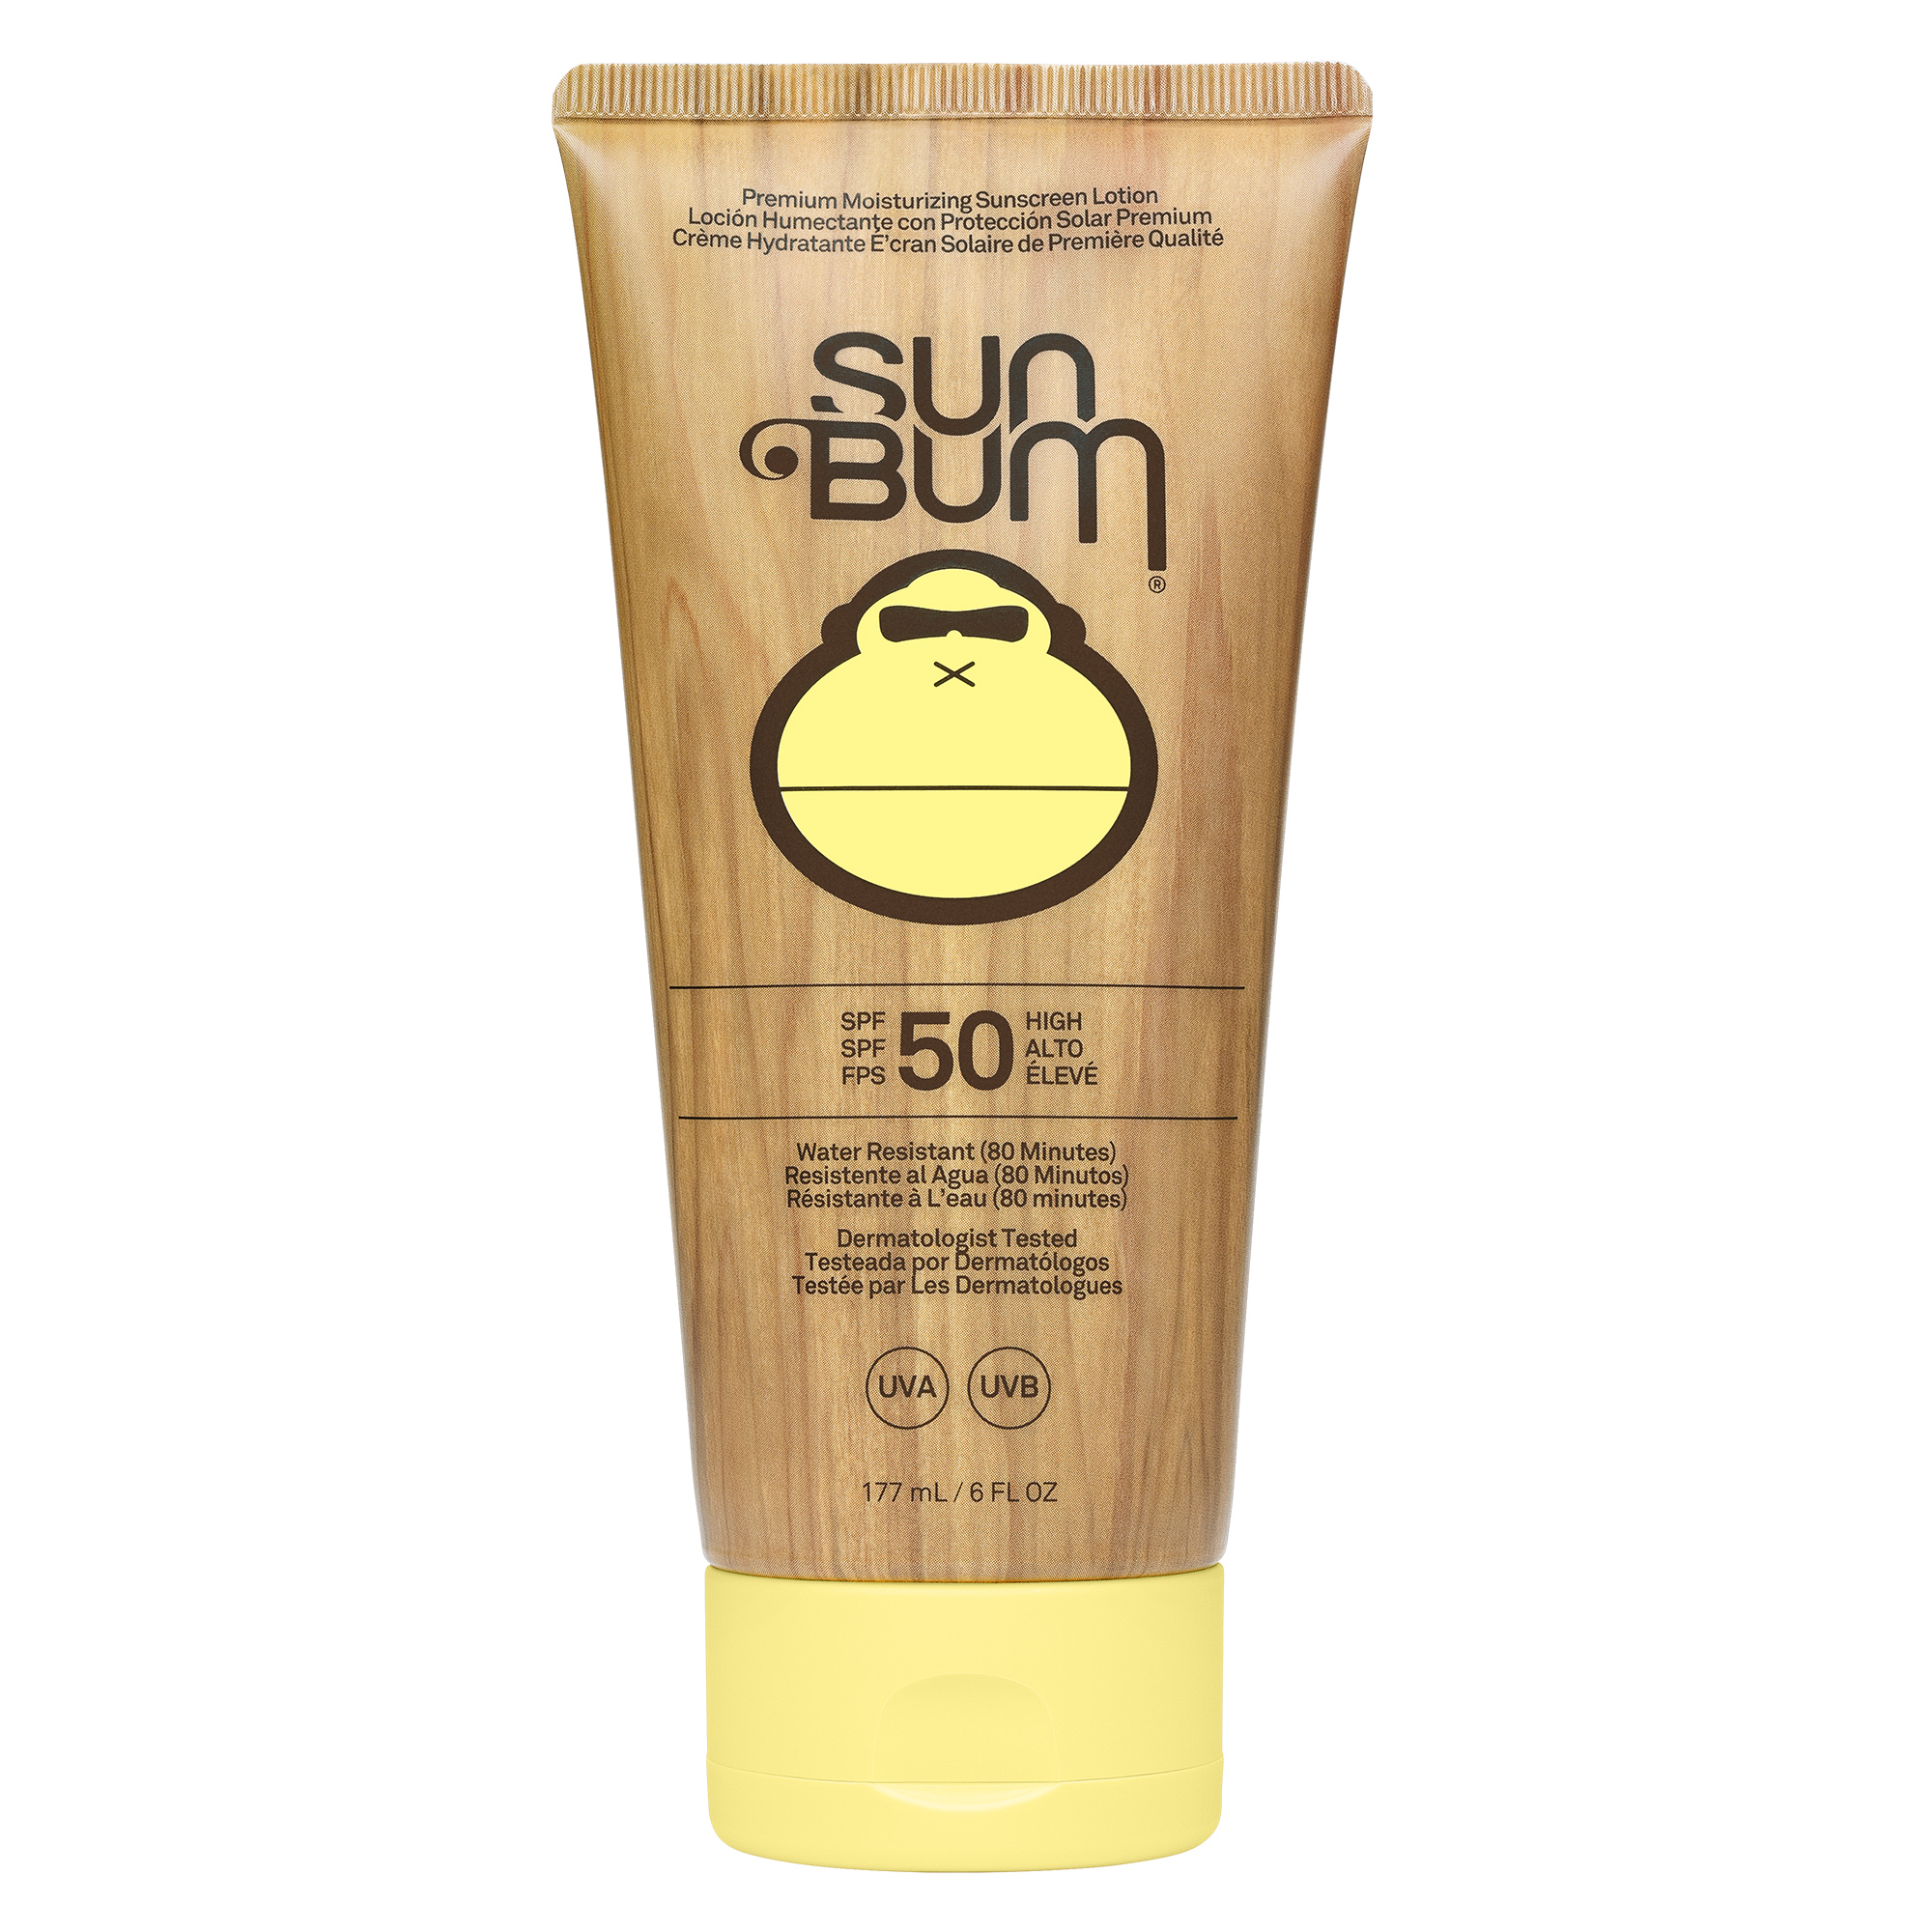 Sun Bum Sunscreen Lotion SPF 50 (front)